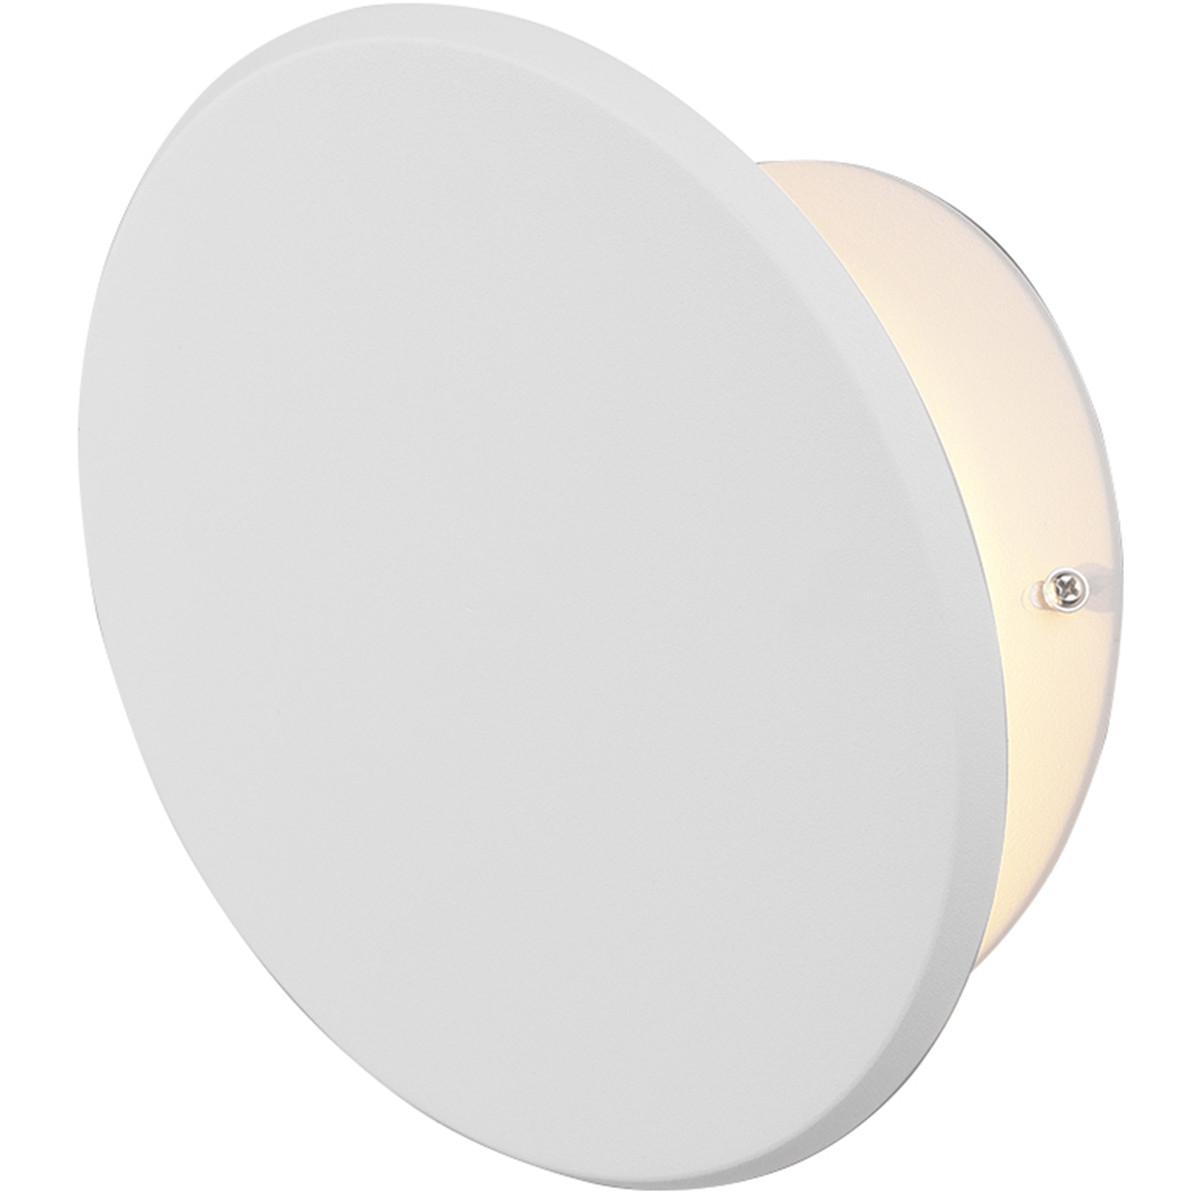 LED Wandlamp - Trion Gasin - 8W - Warm Wit 3000K - Rond - Mat Wit - Aluminium